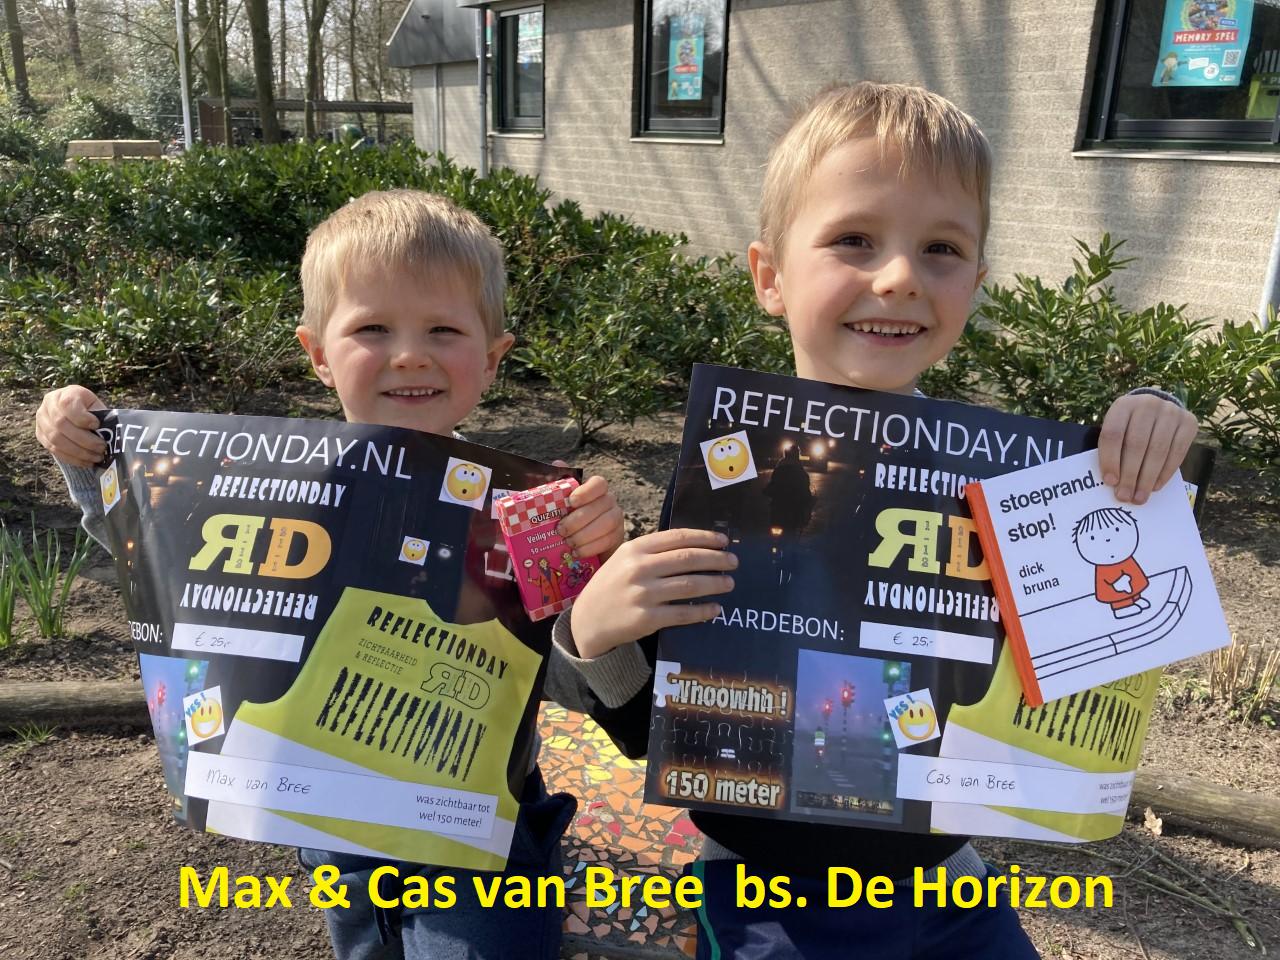 RD Max & Cas van Bree bs De Horizon